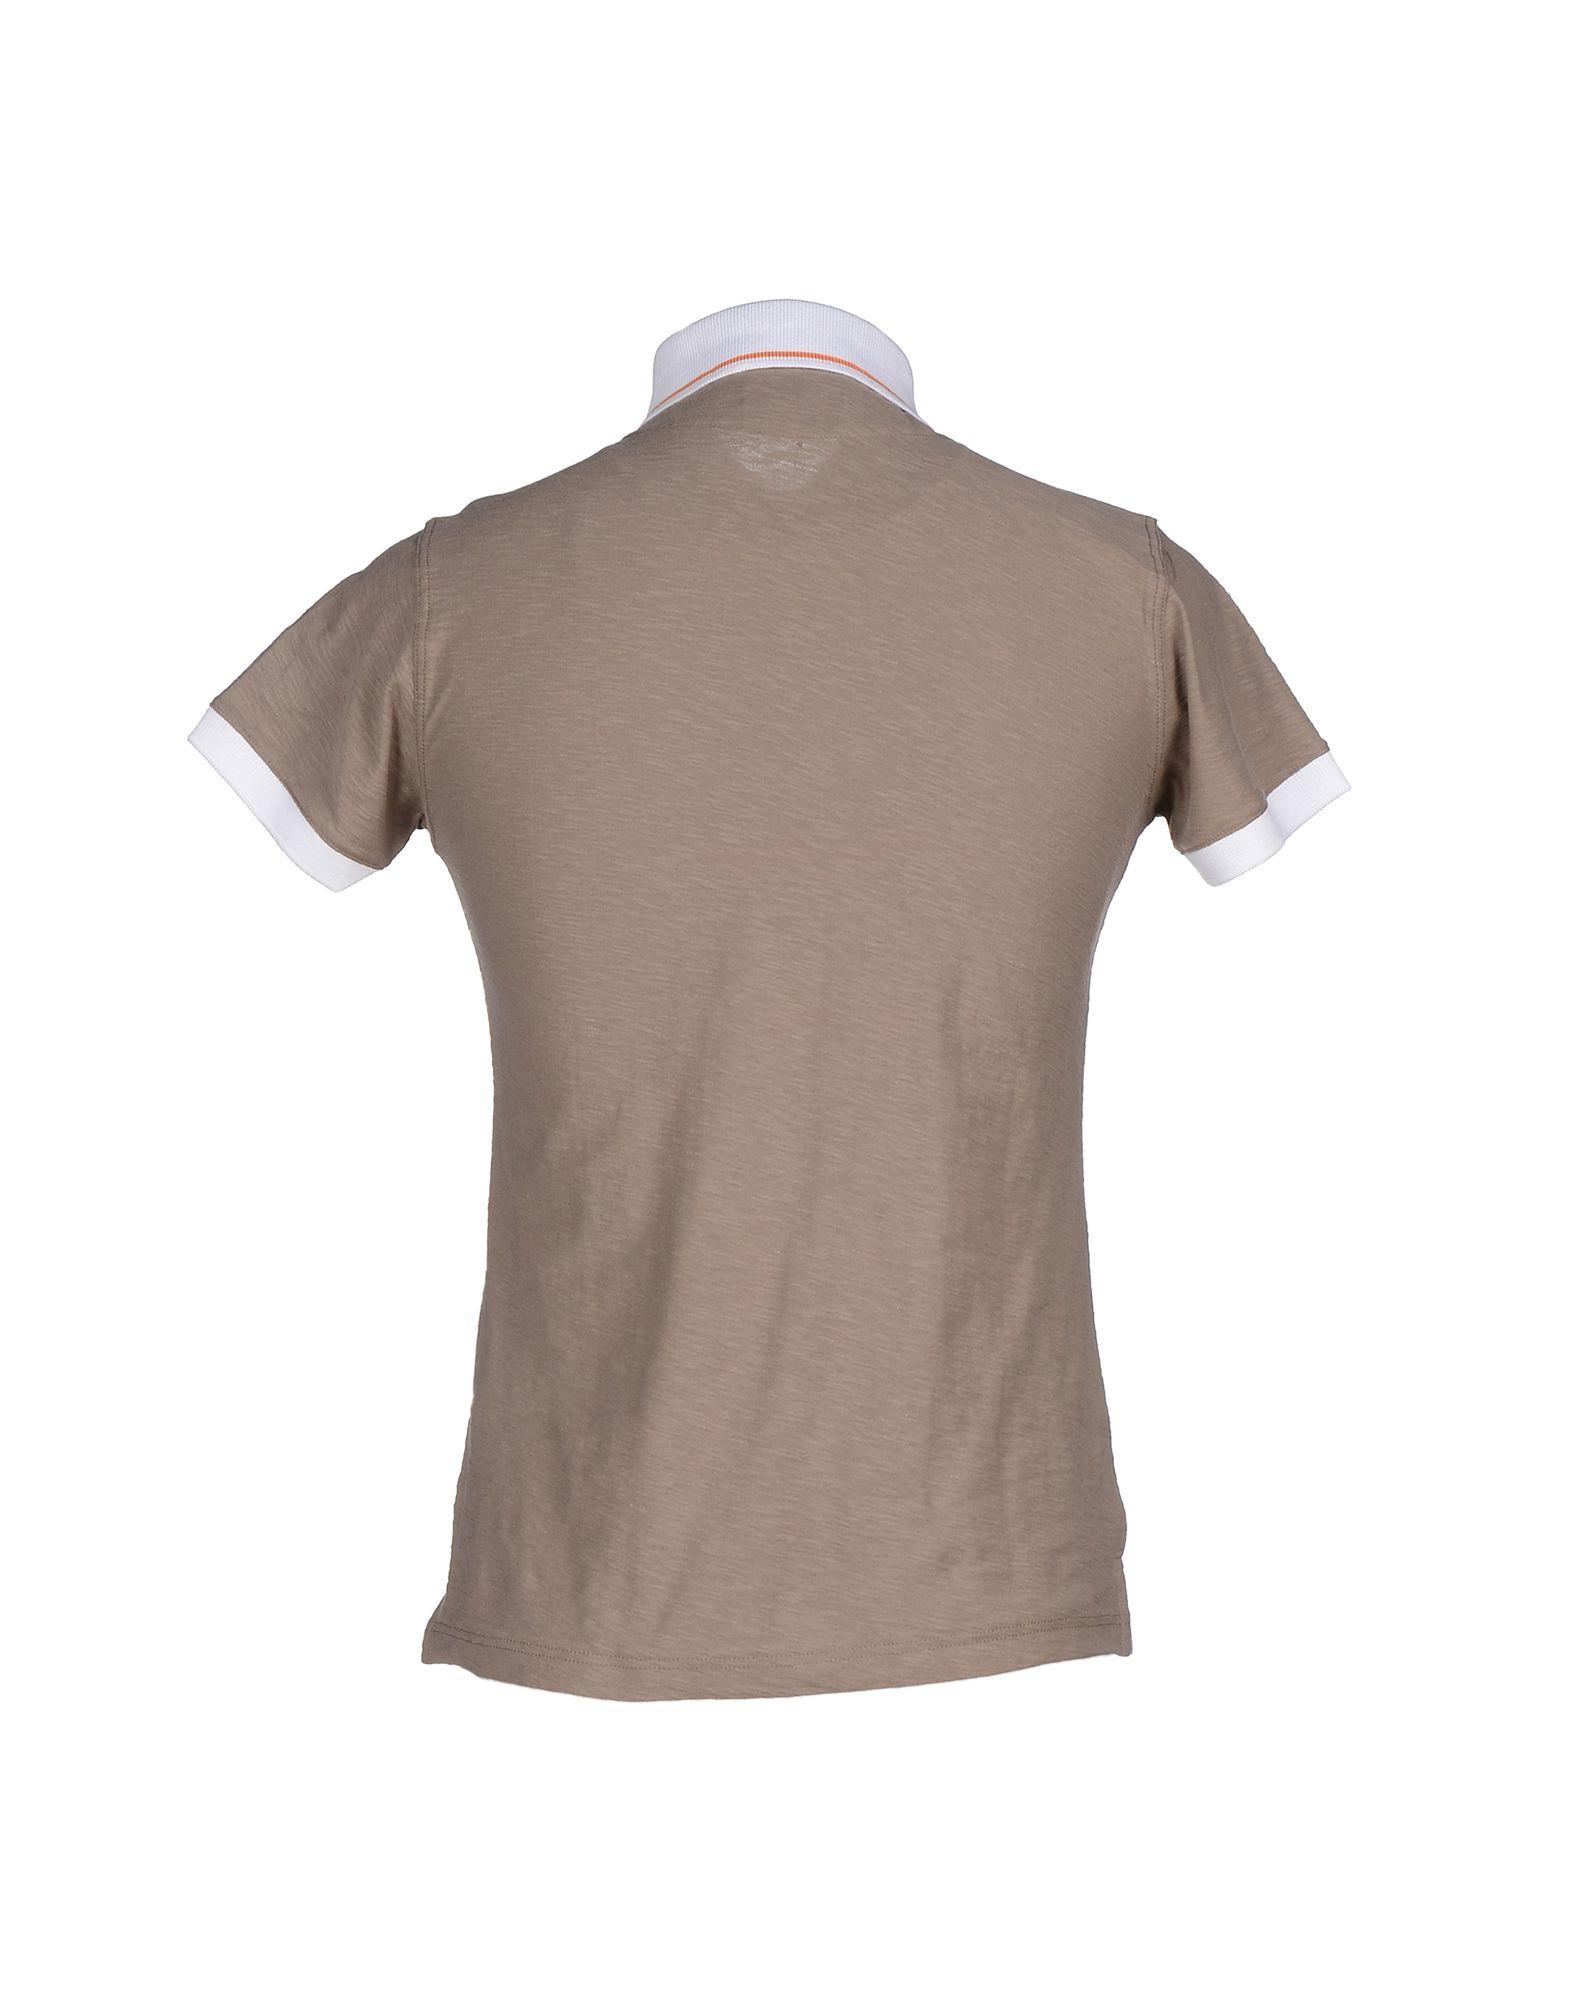 Lyst Barbati Polo Shirt In Brown For Men